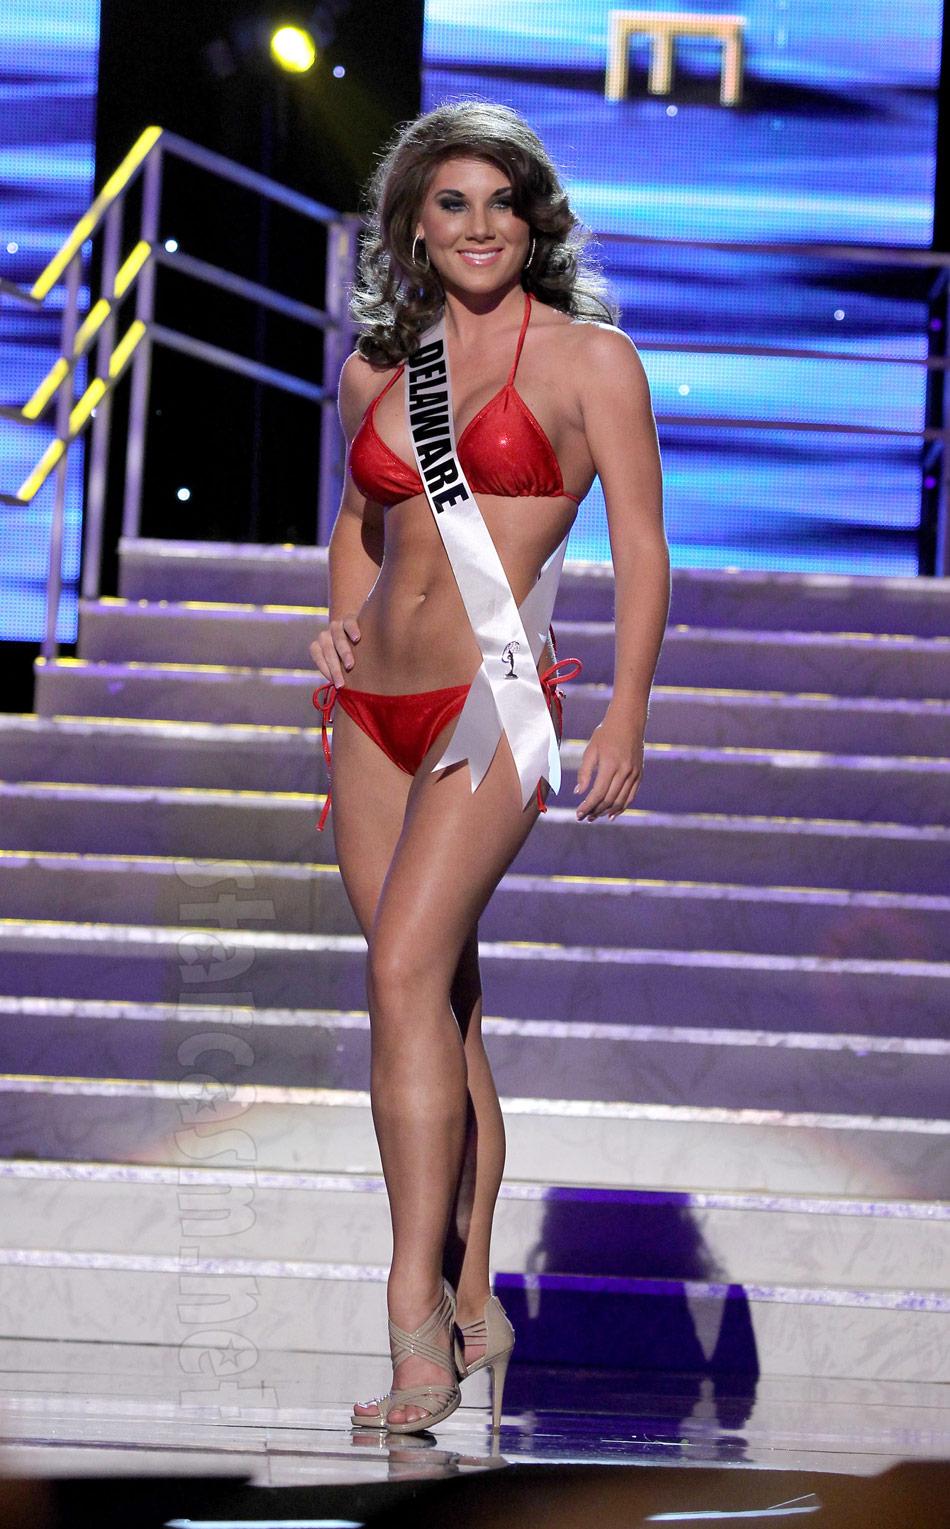 Katie from Survivor: Philippines beautiful in a bikini